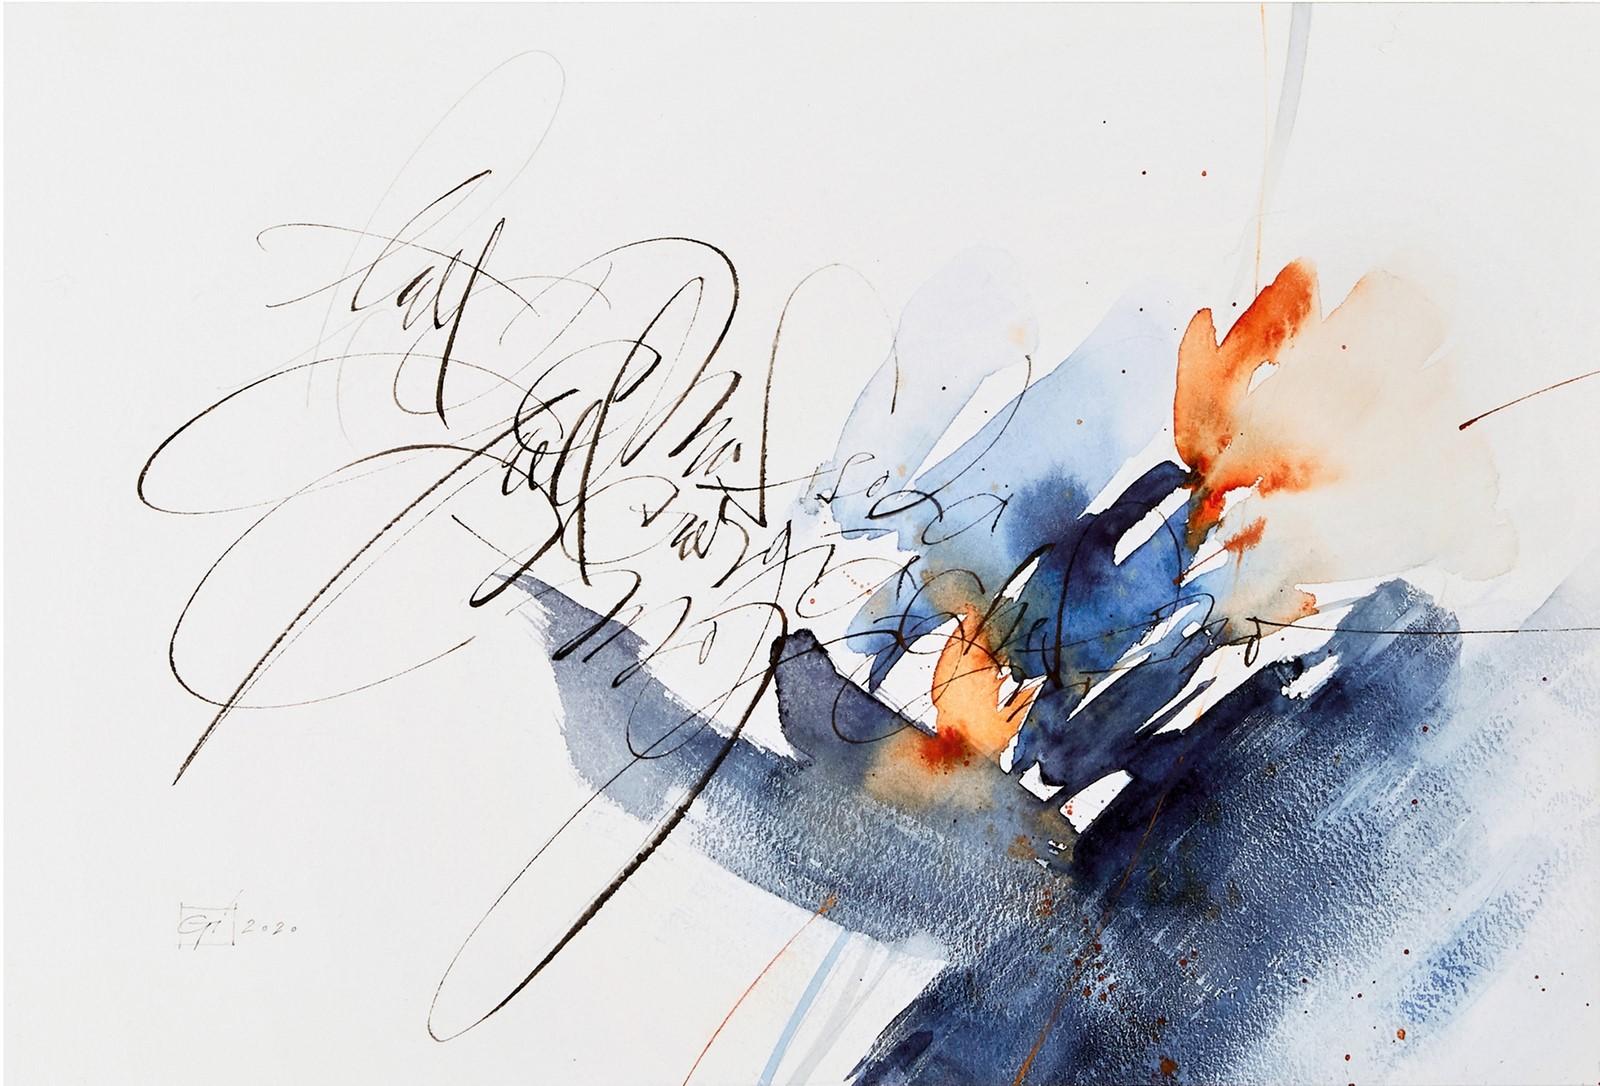 "<p><em><span lang='EN-US'>""The Spirit"", ""Everything is moved by that energy which is emotions"", Watercolour, ink and gesso on cotton paper BFK rieves, 35x23,5 cm, 2020.<br /></span></em><em><span lang='EN-US'>""Tin"", ""Her şey duygular olan o enerji tarafından hareket ettirilir. Suluboya, mürekkep ve gesso astarlı BFK rives pamuklu kağıt, 35x23,5 cm, 2020.</span></em></p><p></p>"